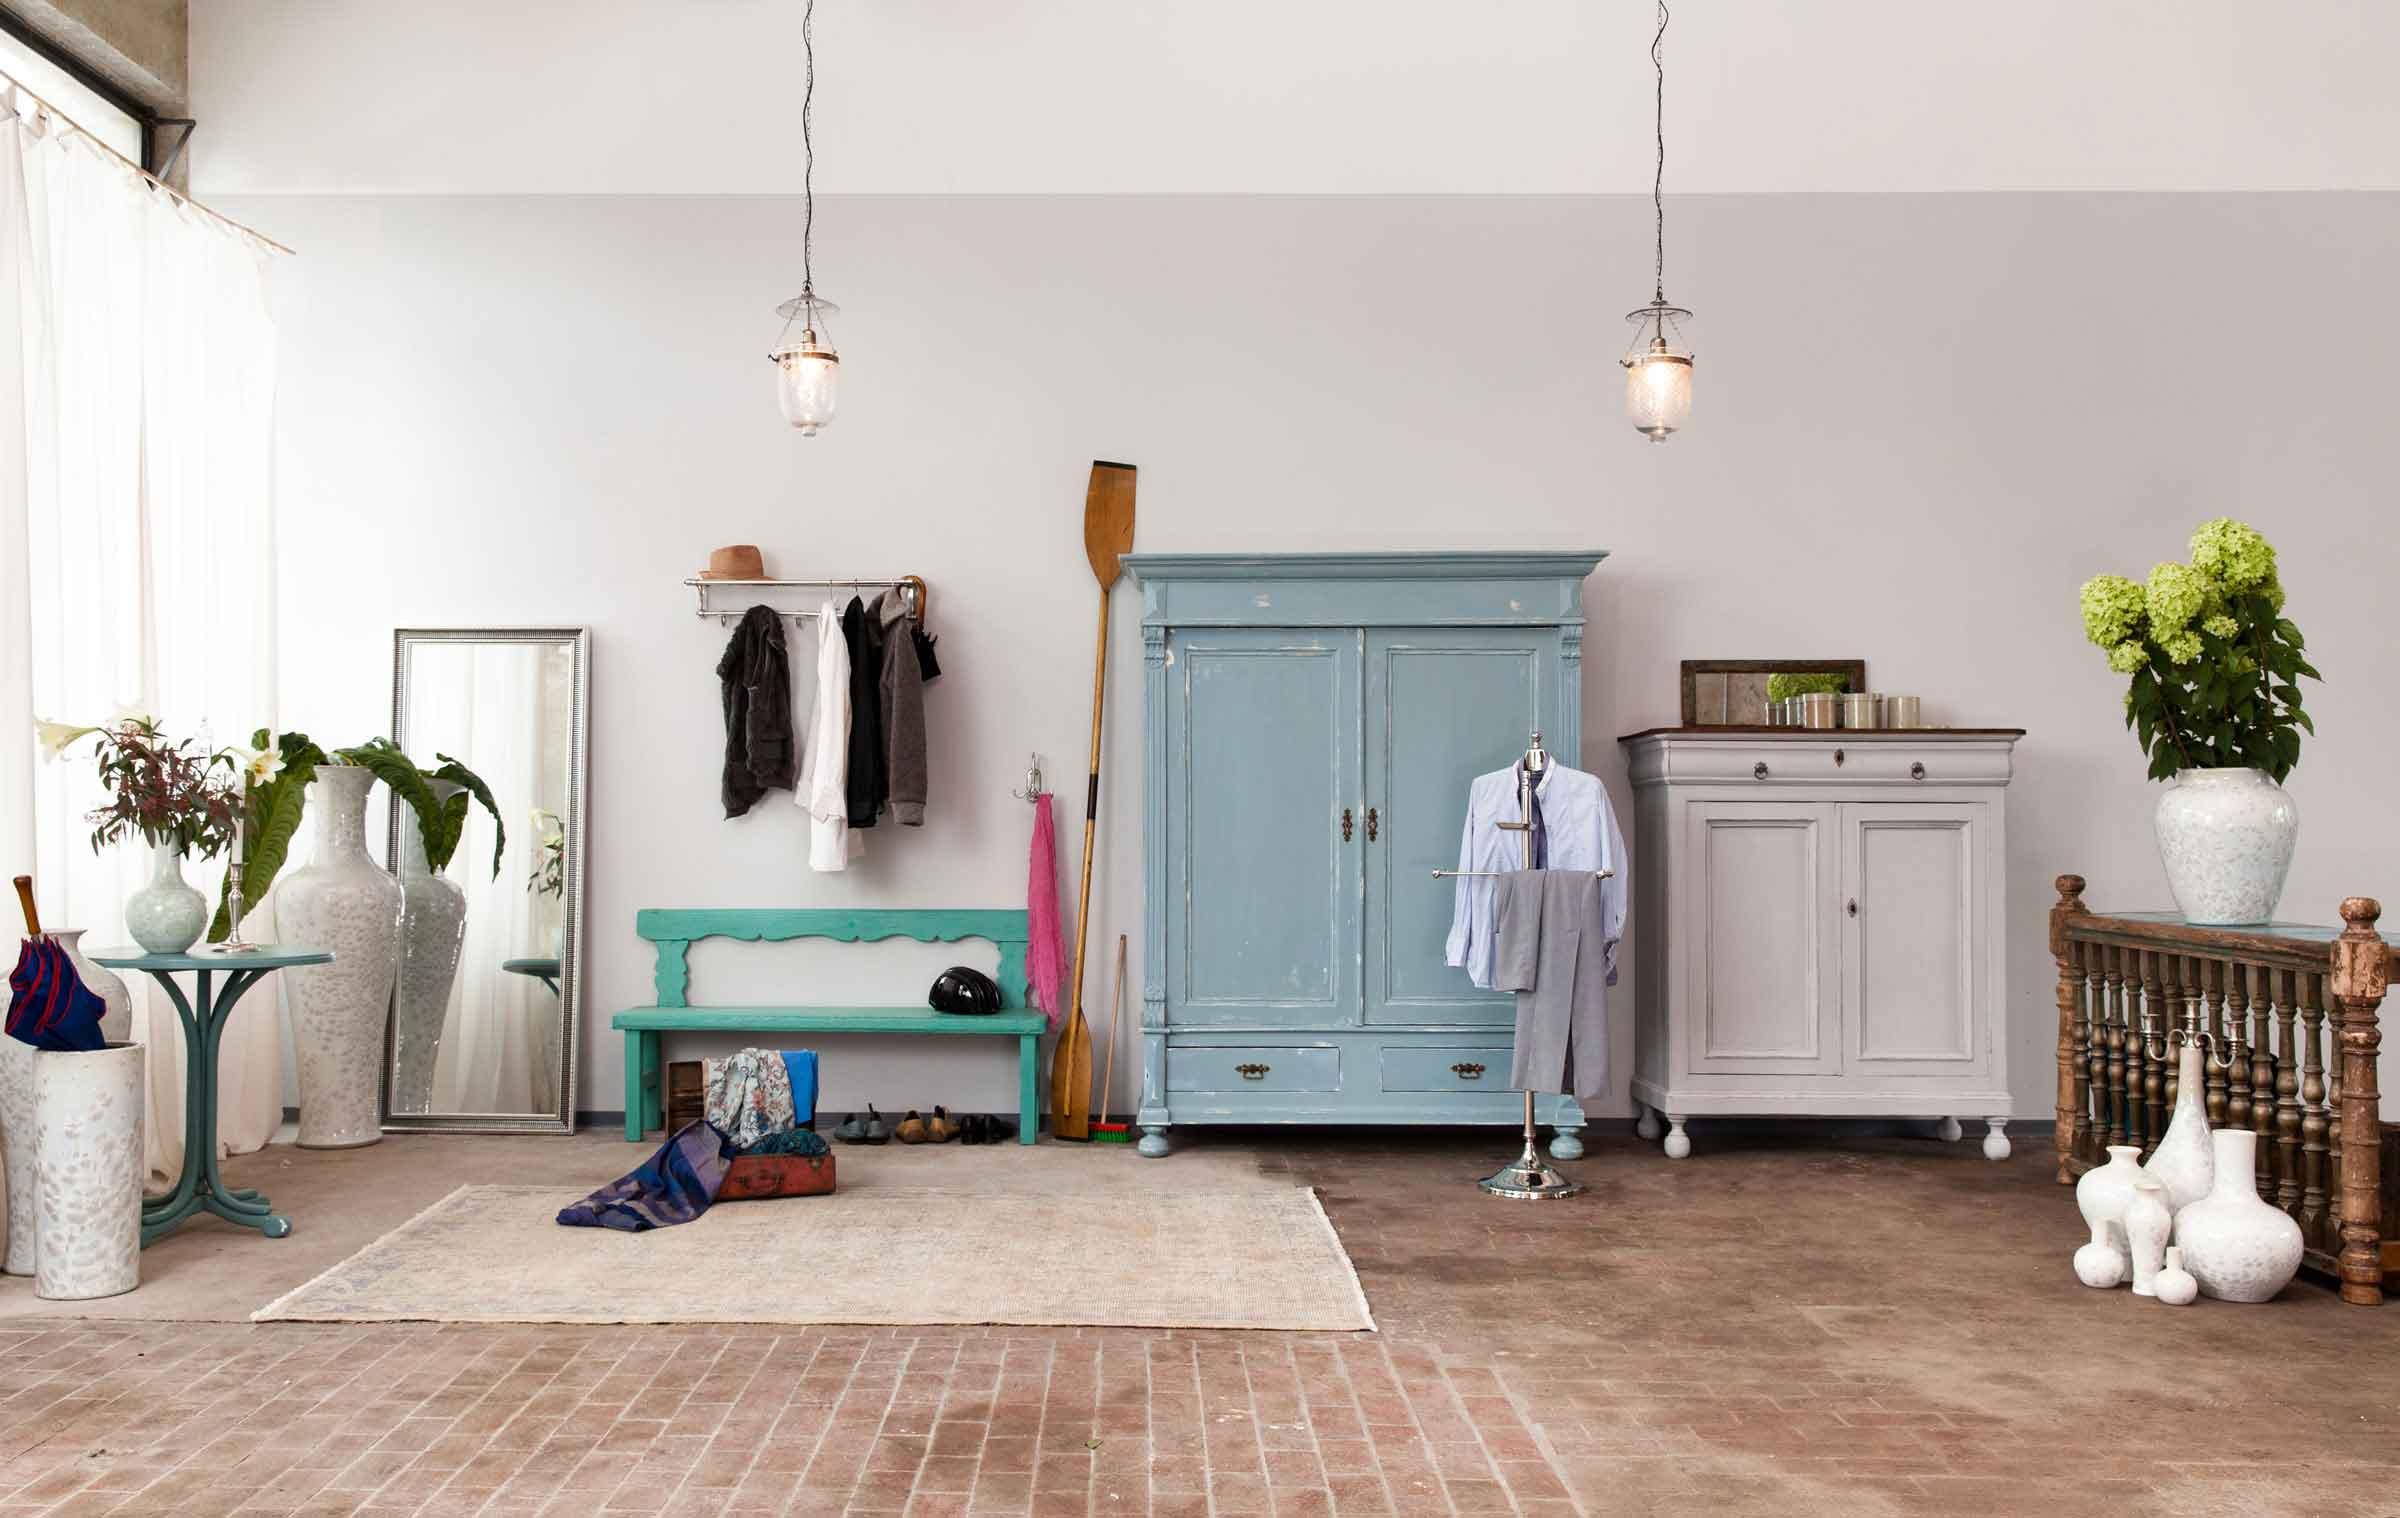 mobelhauser dresden im quelle online shop with mobelhauser dresden good mobelhauser dresden. Black Bedroom Furniture Sets. Home Design Ideas